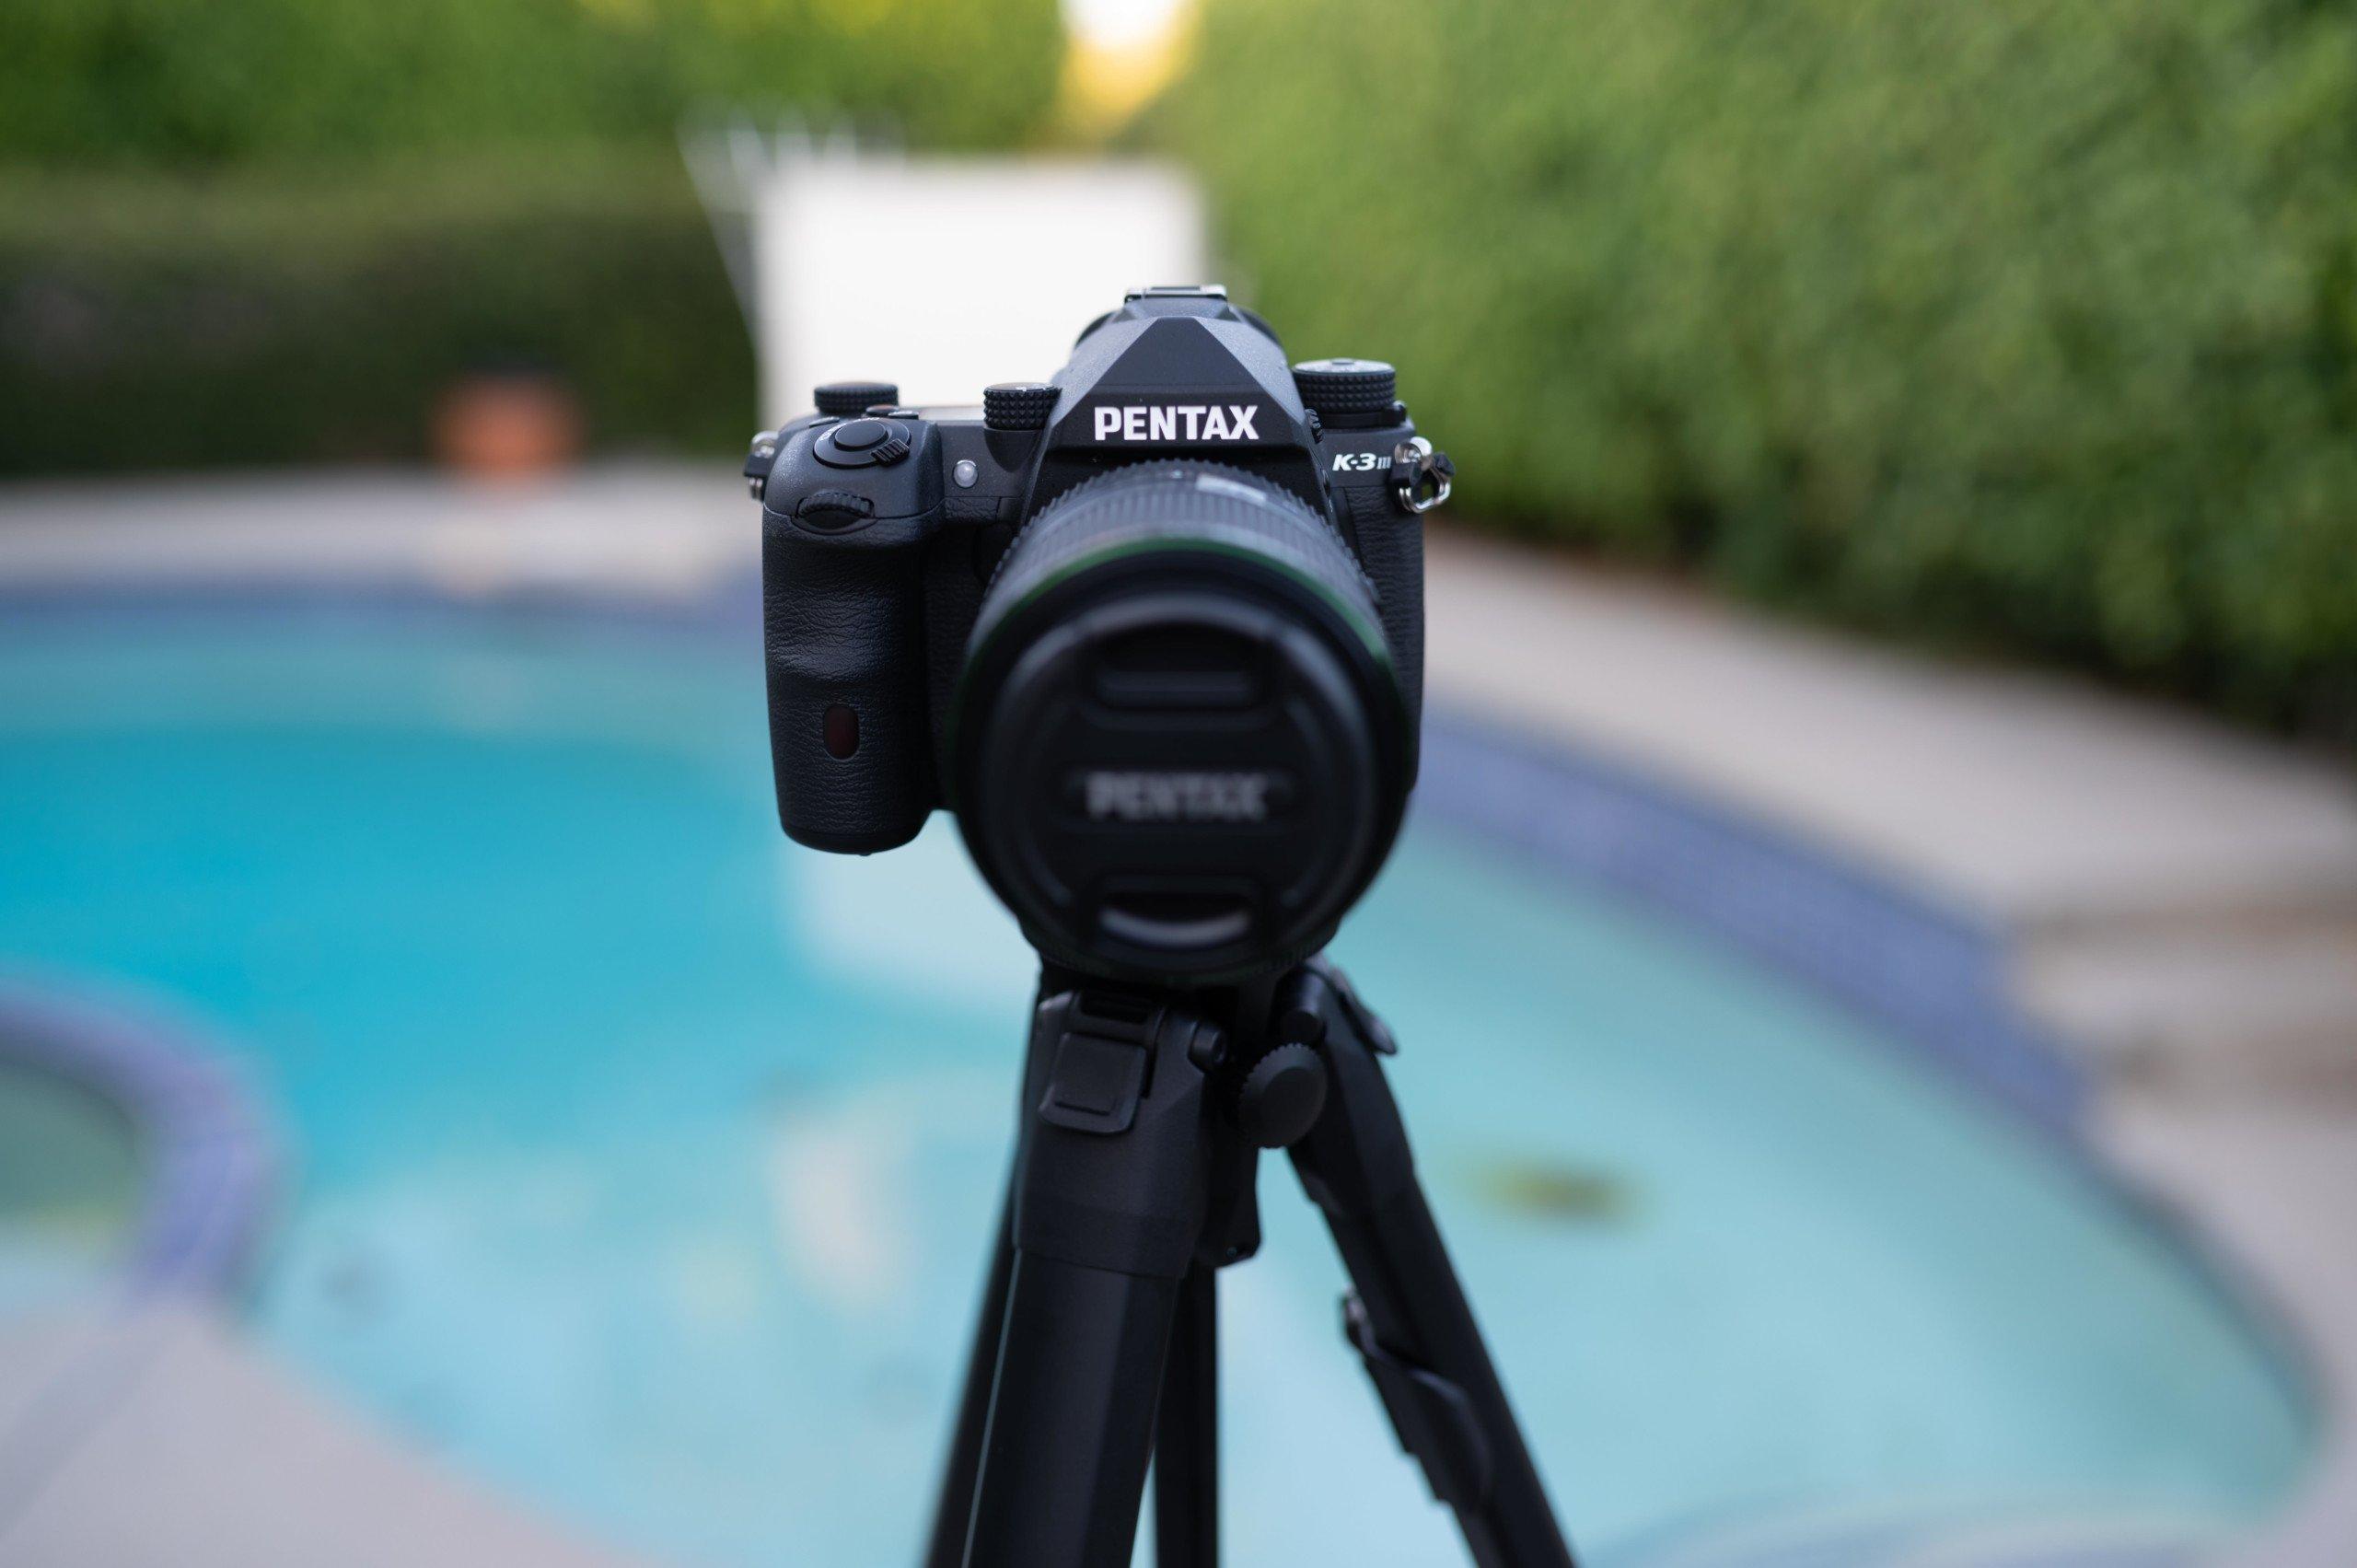 Pentax K-3 Mark III Review: An Excellent, Expensive DSLR 8